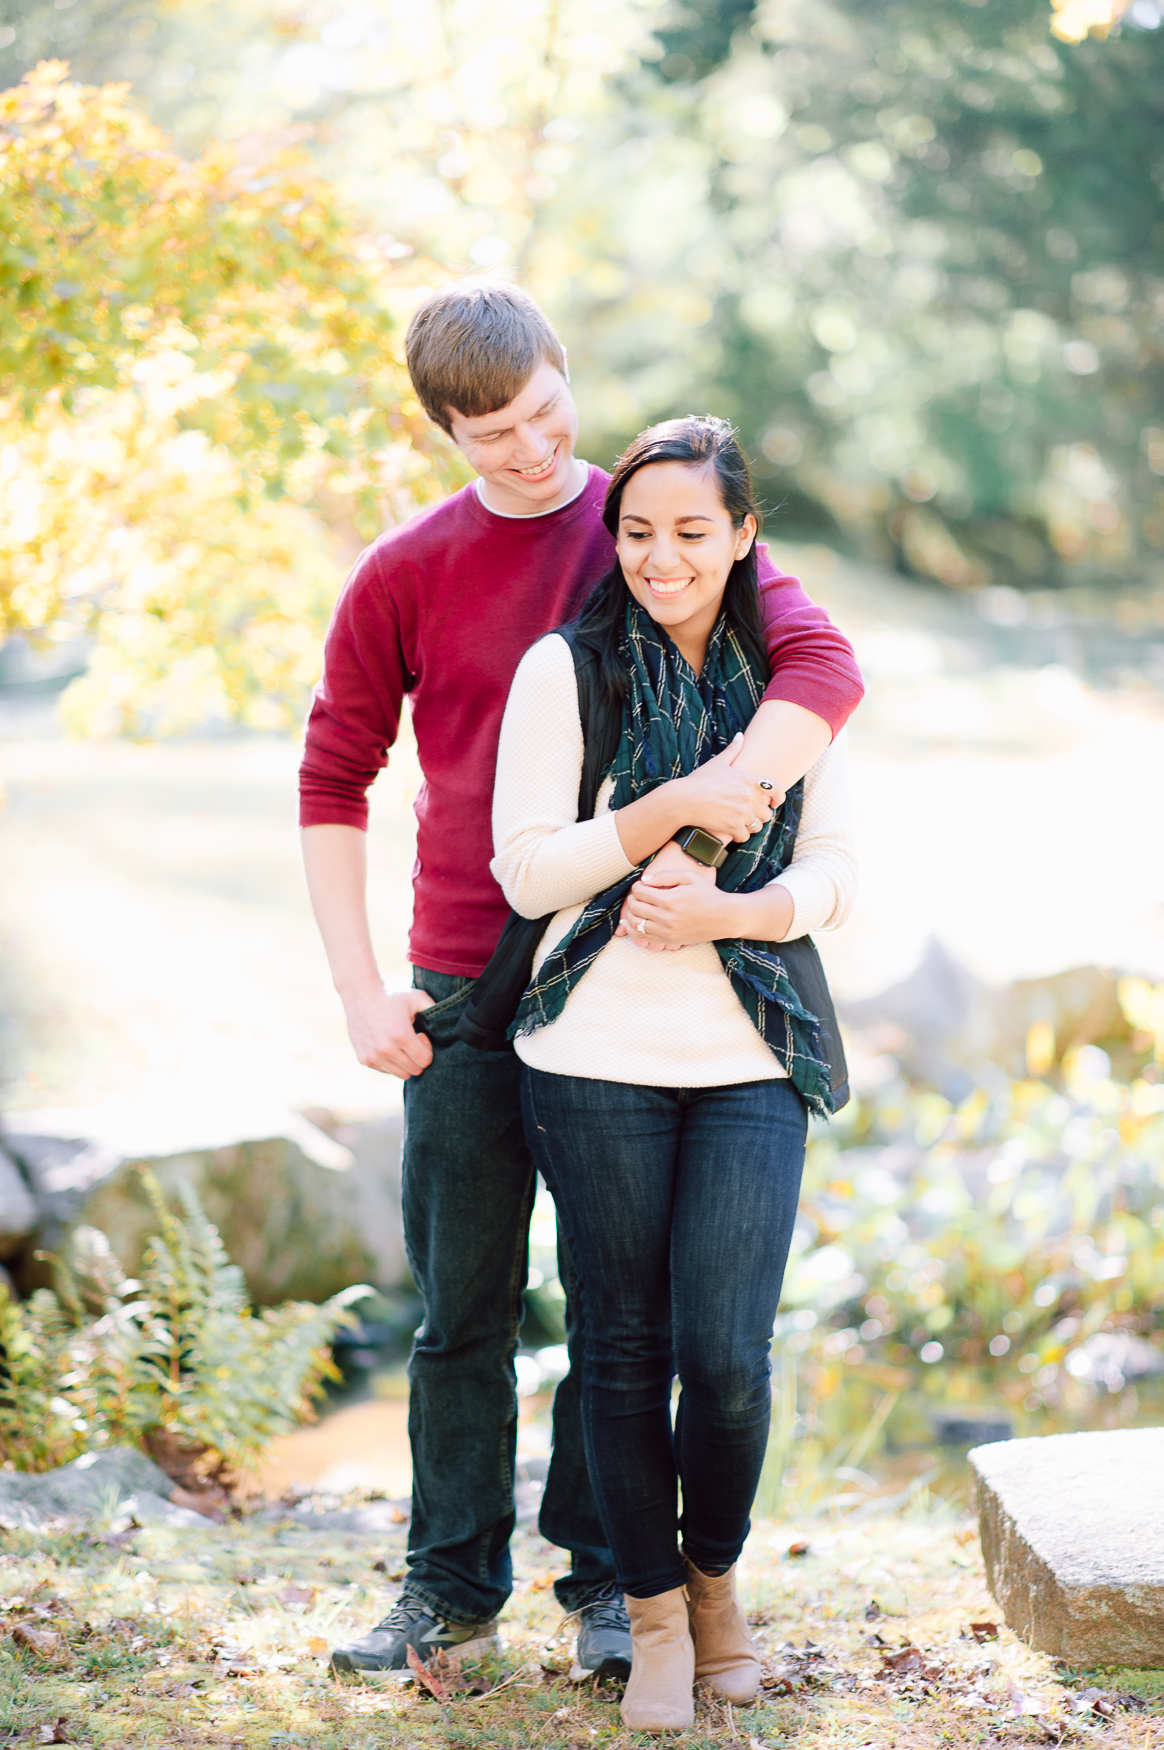 Fall_engagement_maymont_virginiawedding_youseephotography_CatherineCody (2).jpg